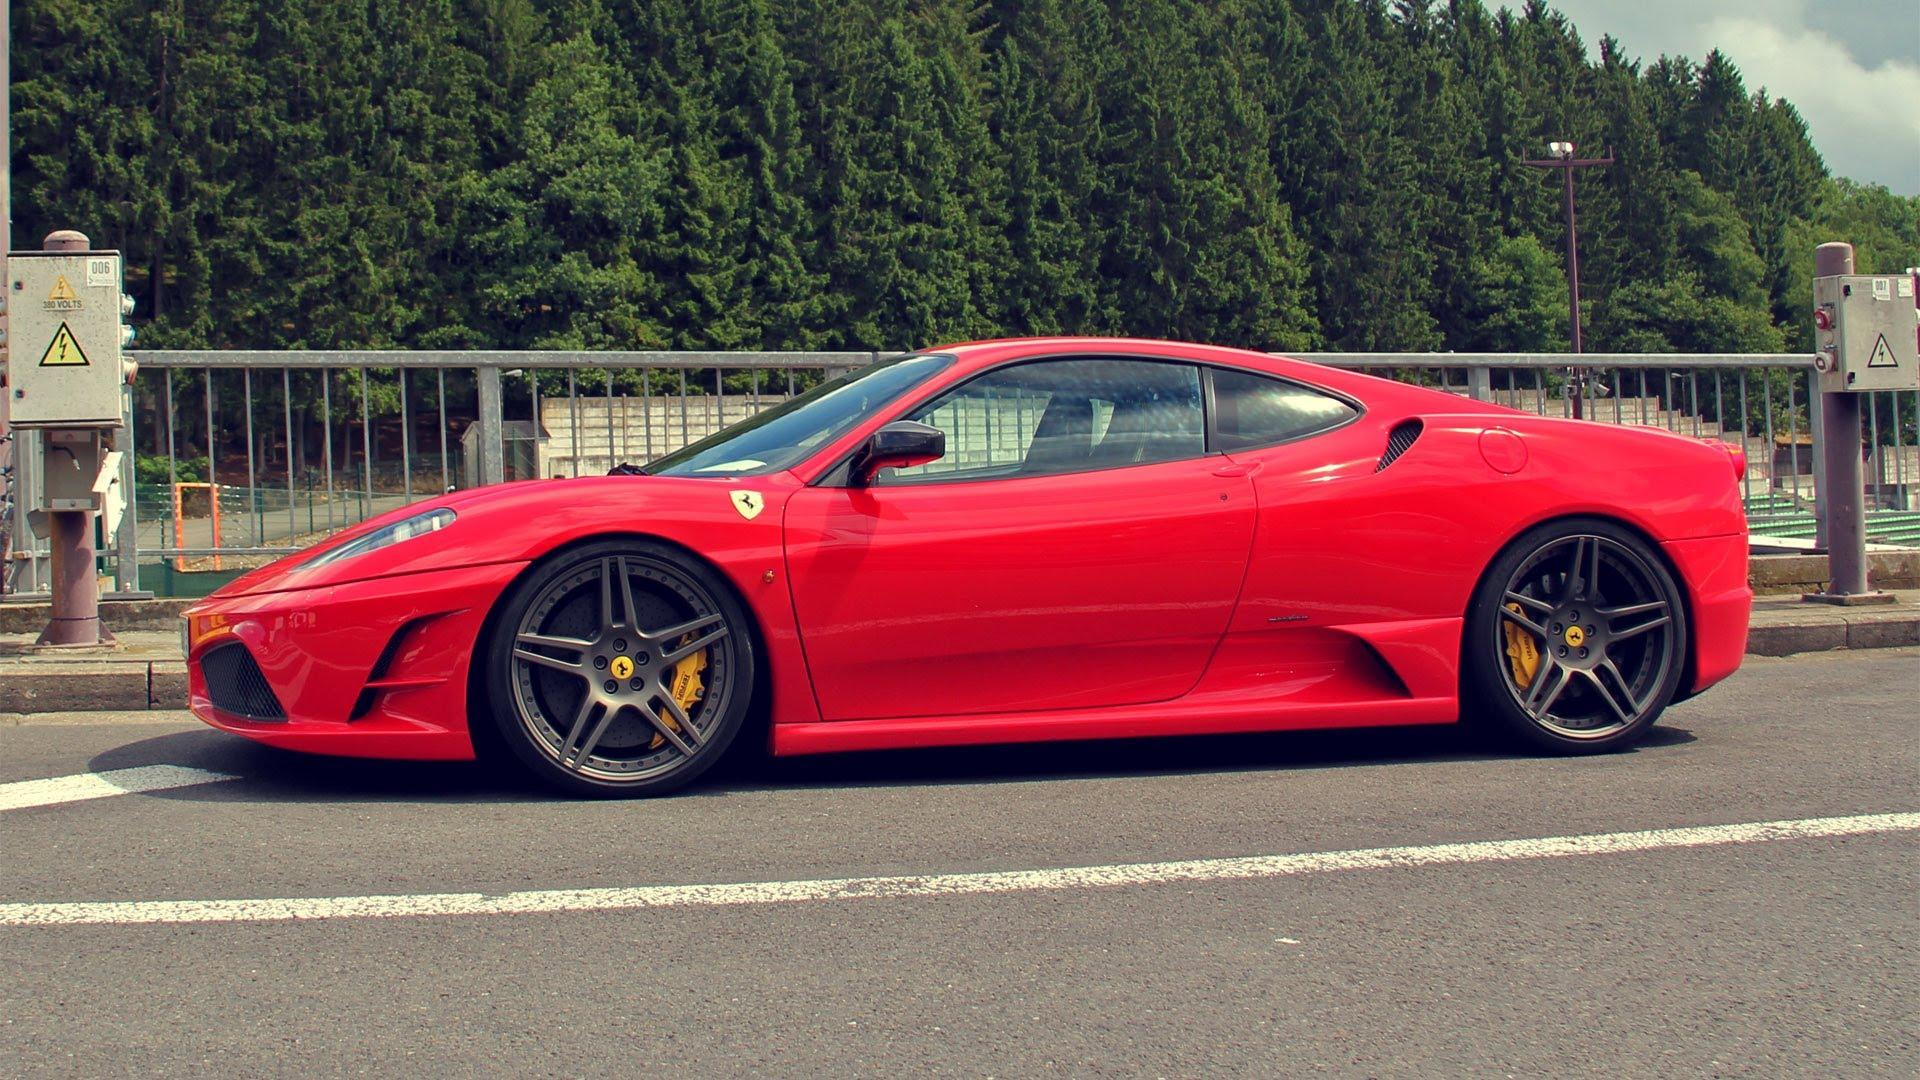 1080p Car Wallpaper Pack Ferrari F430 Scuderia Wallpapers High Quality Download Free